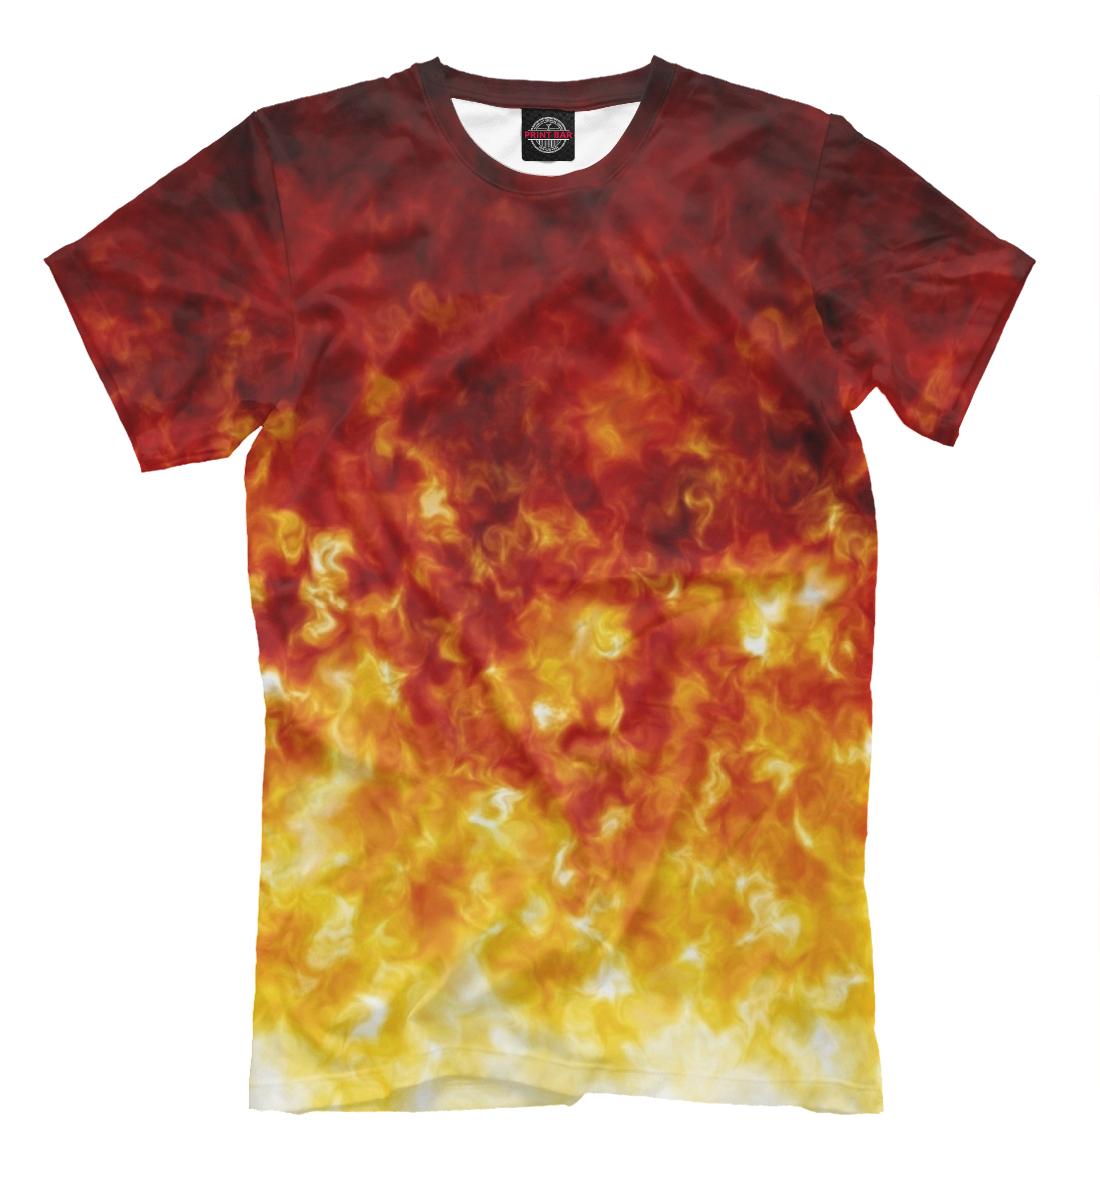 Купить Яркое пламя, Printbar, Футболки, STI-271139-fut-2